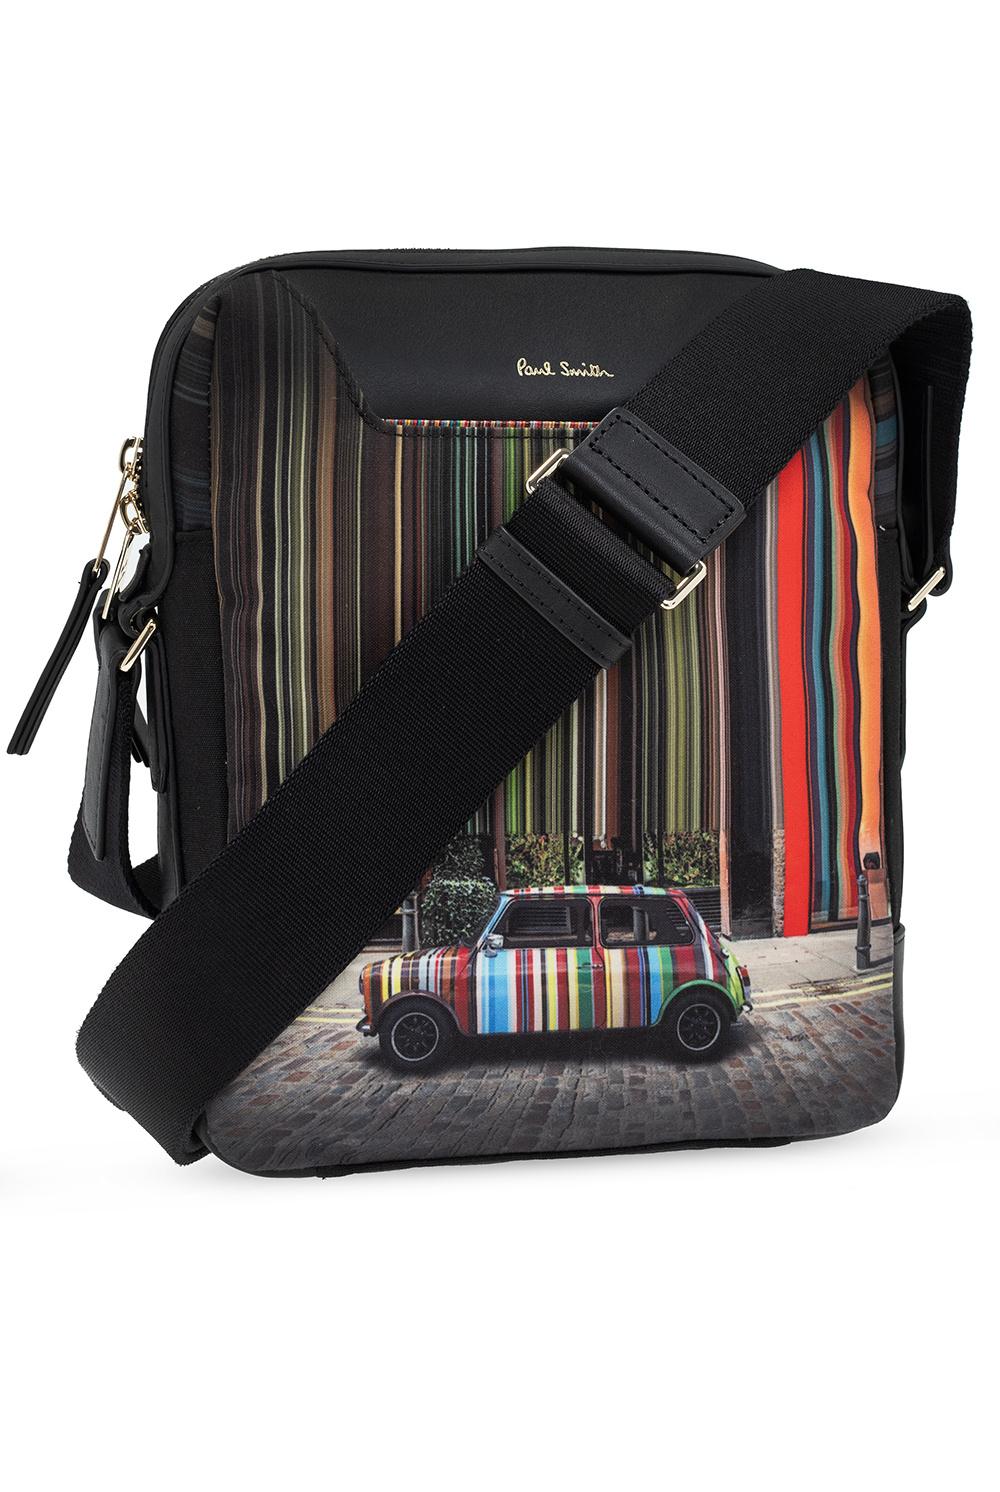 Paul Smith Printed shoulder bag